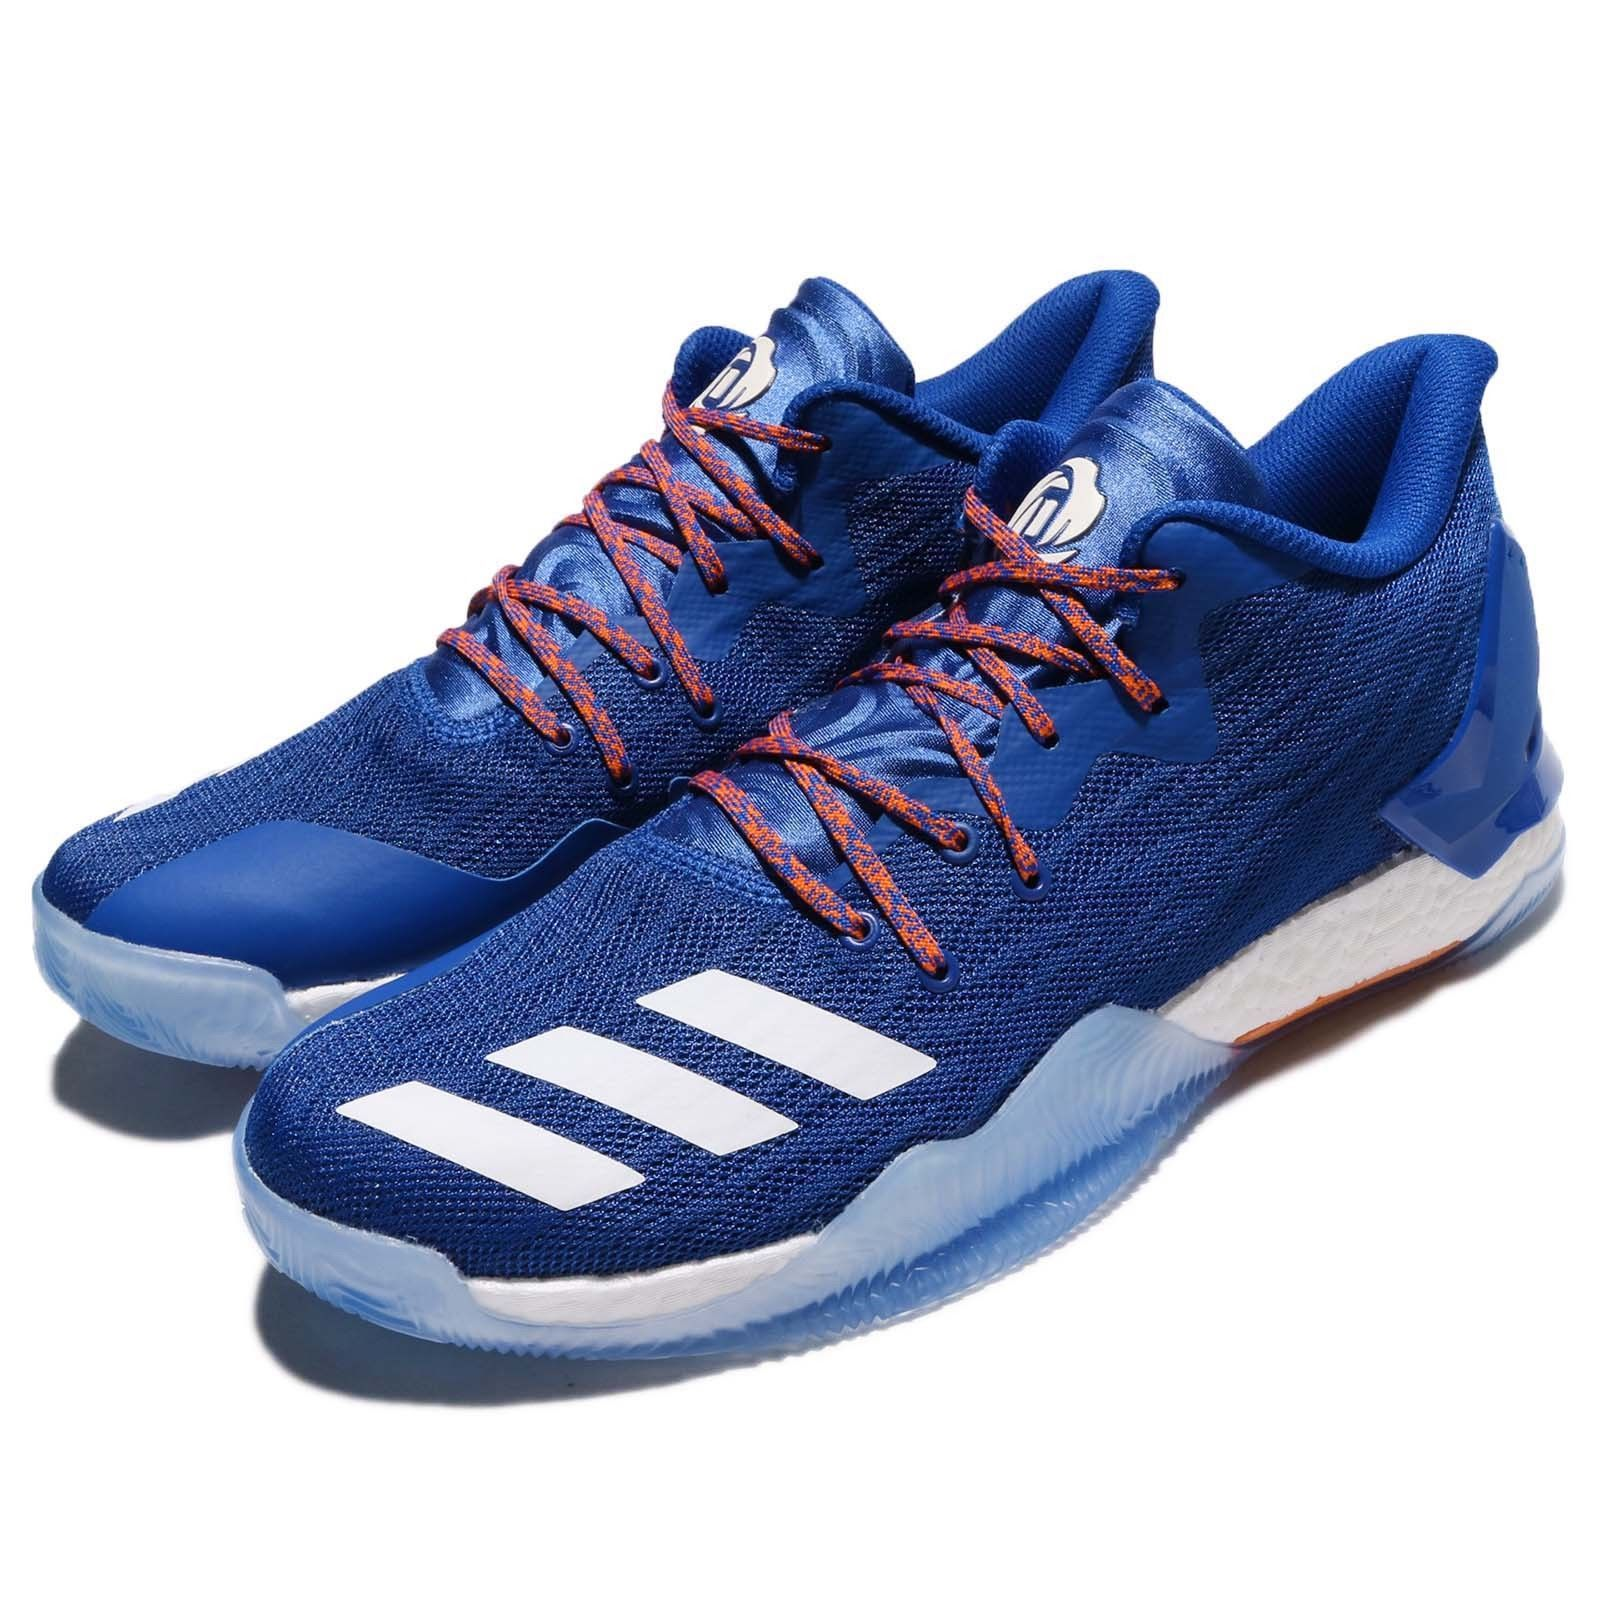 609e8e768be adidas D Rose 7 Low Derrick Rose Knicks Blue Orange Men Basketball Shoes  BY4499